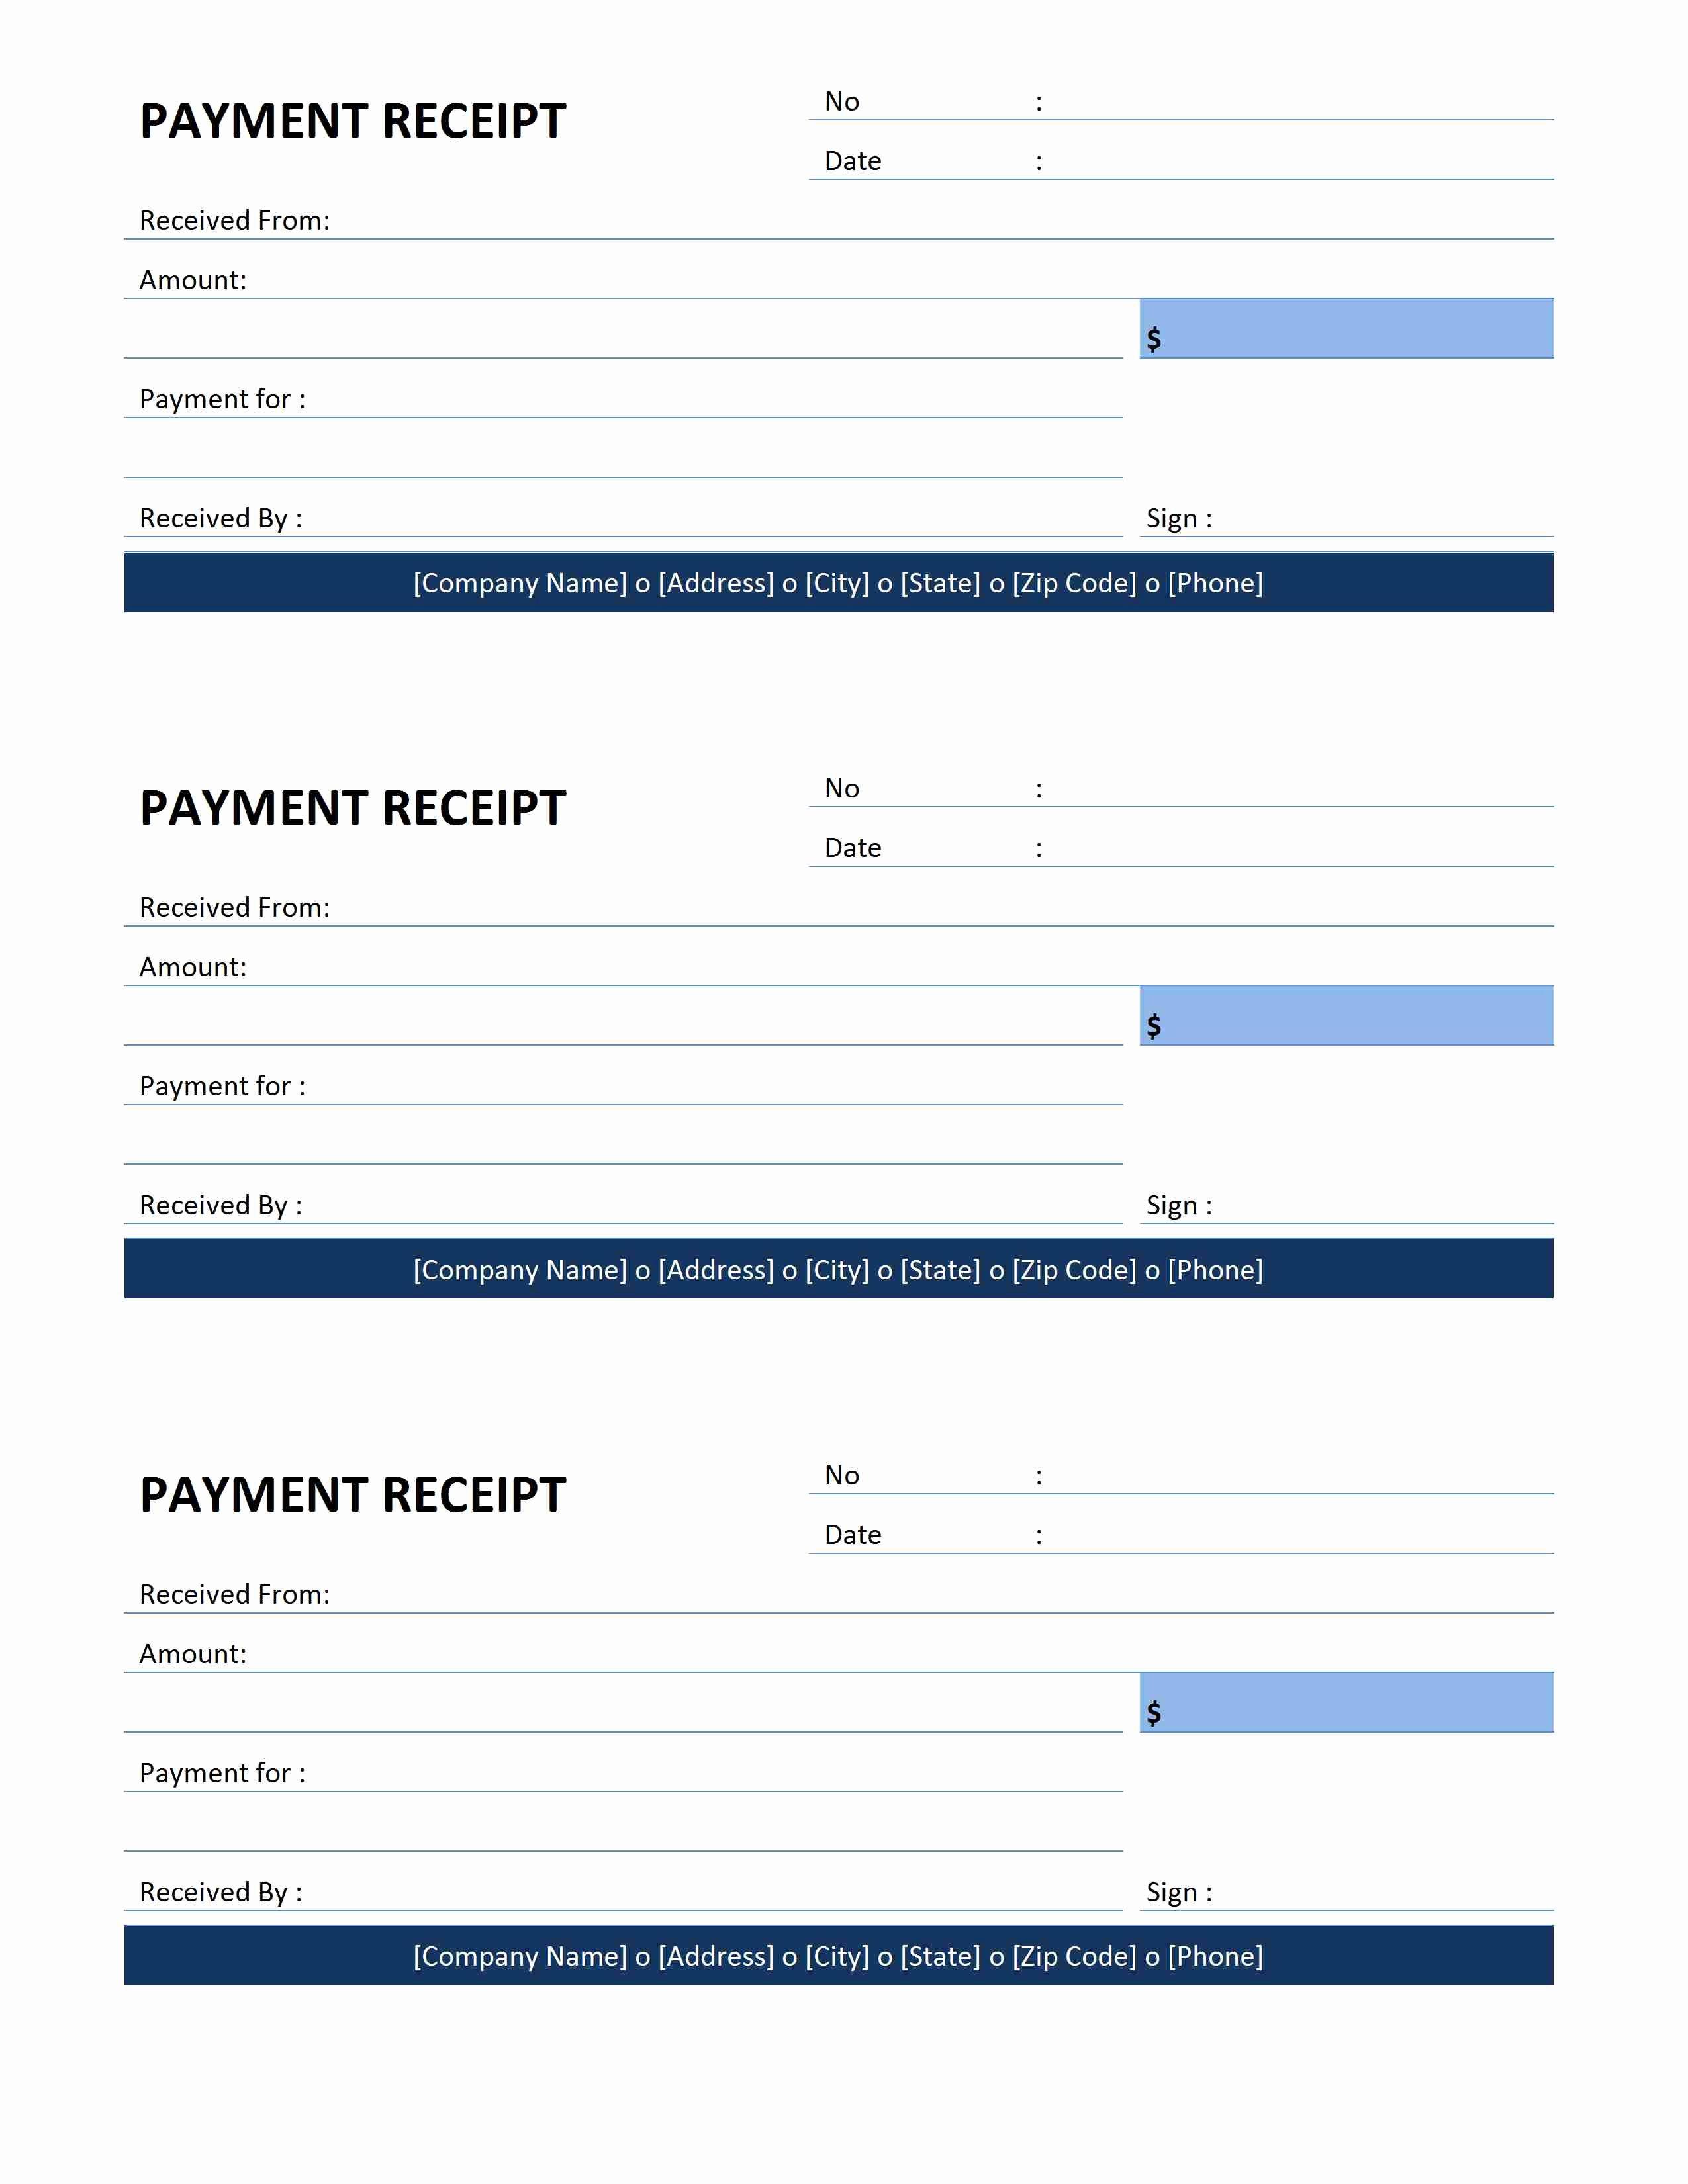 Payment Receipt Template Word Lovely Payment Receipt